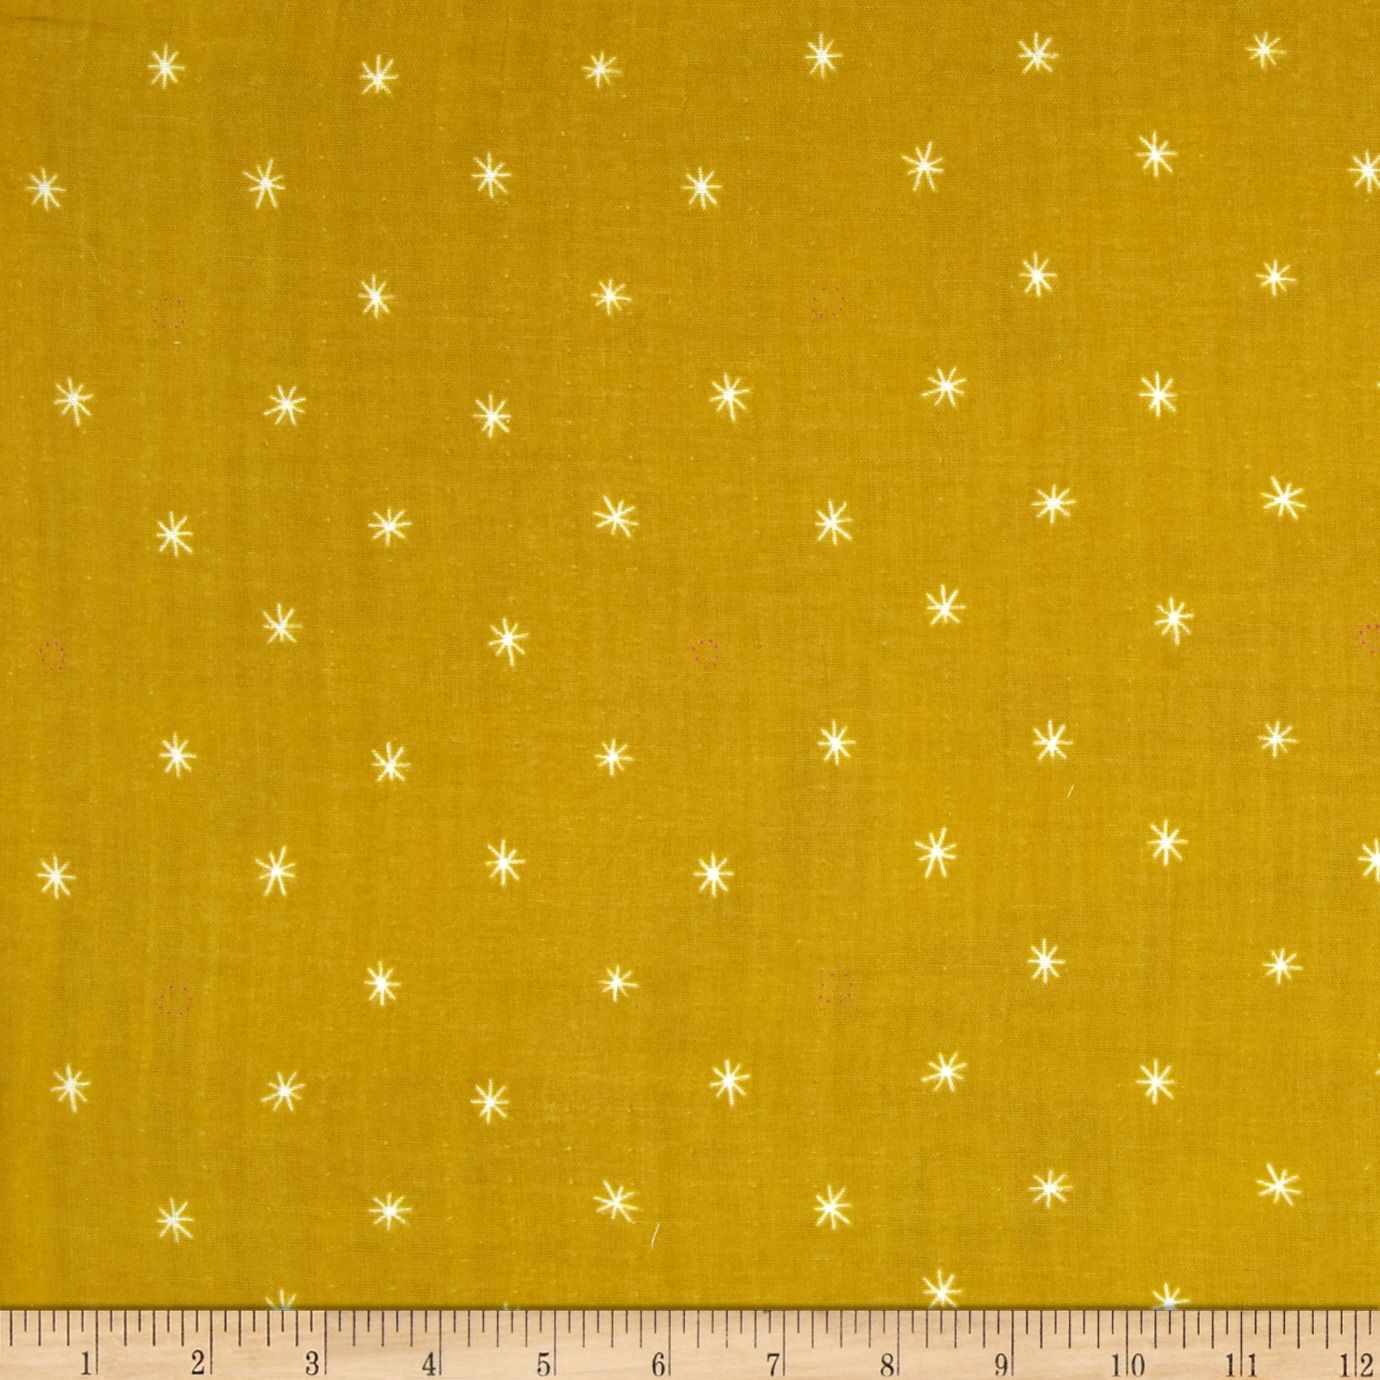 Cotton & Steel BeSpoke Cotton Double Gauze Spark Mustard Fabric